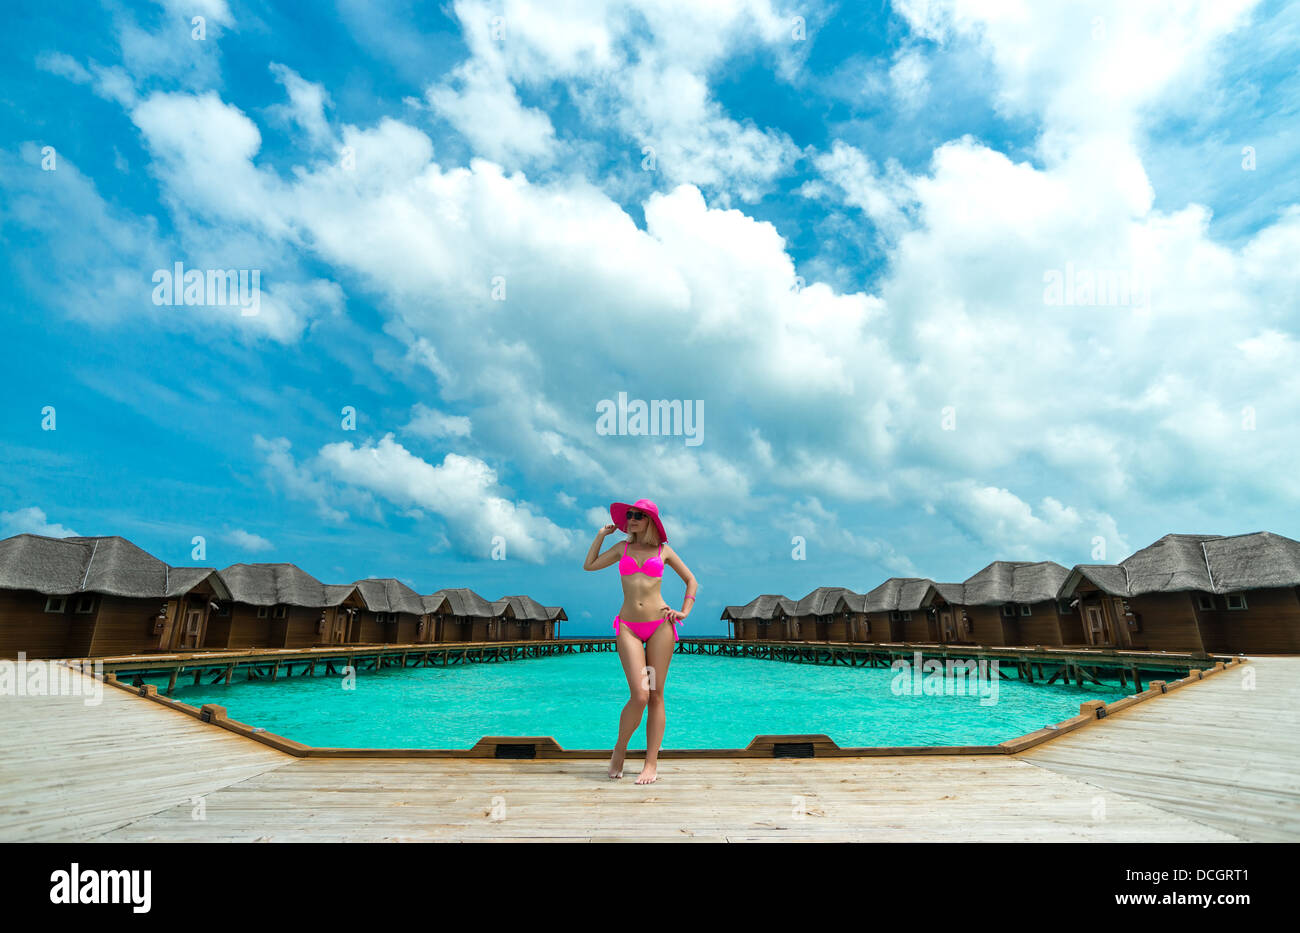 Woman on a beach jetty at Maldives - Stock Image